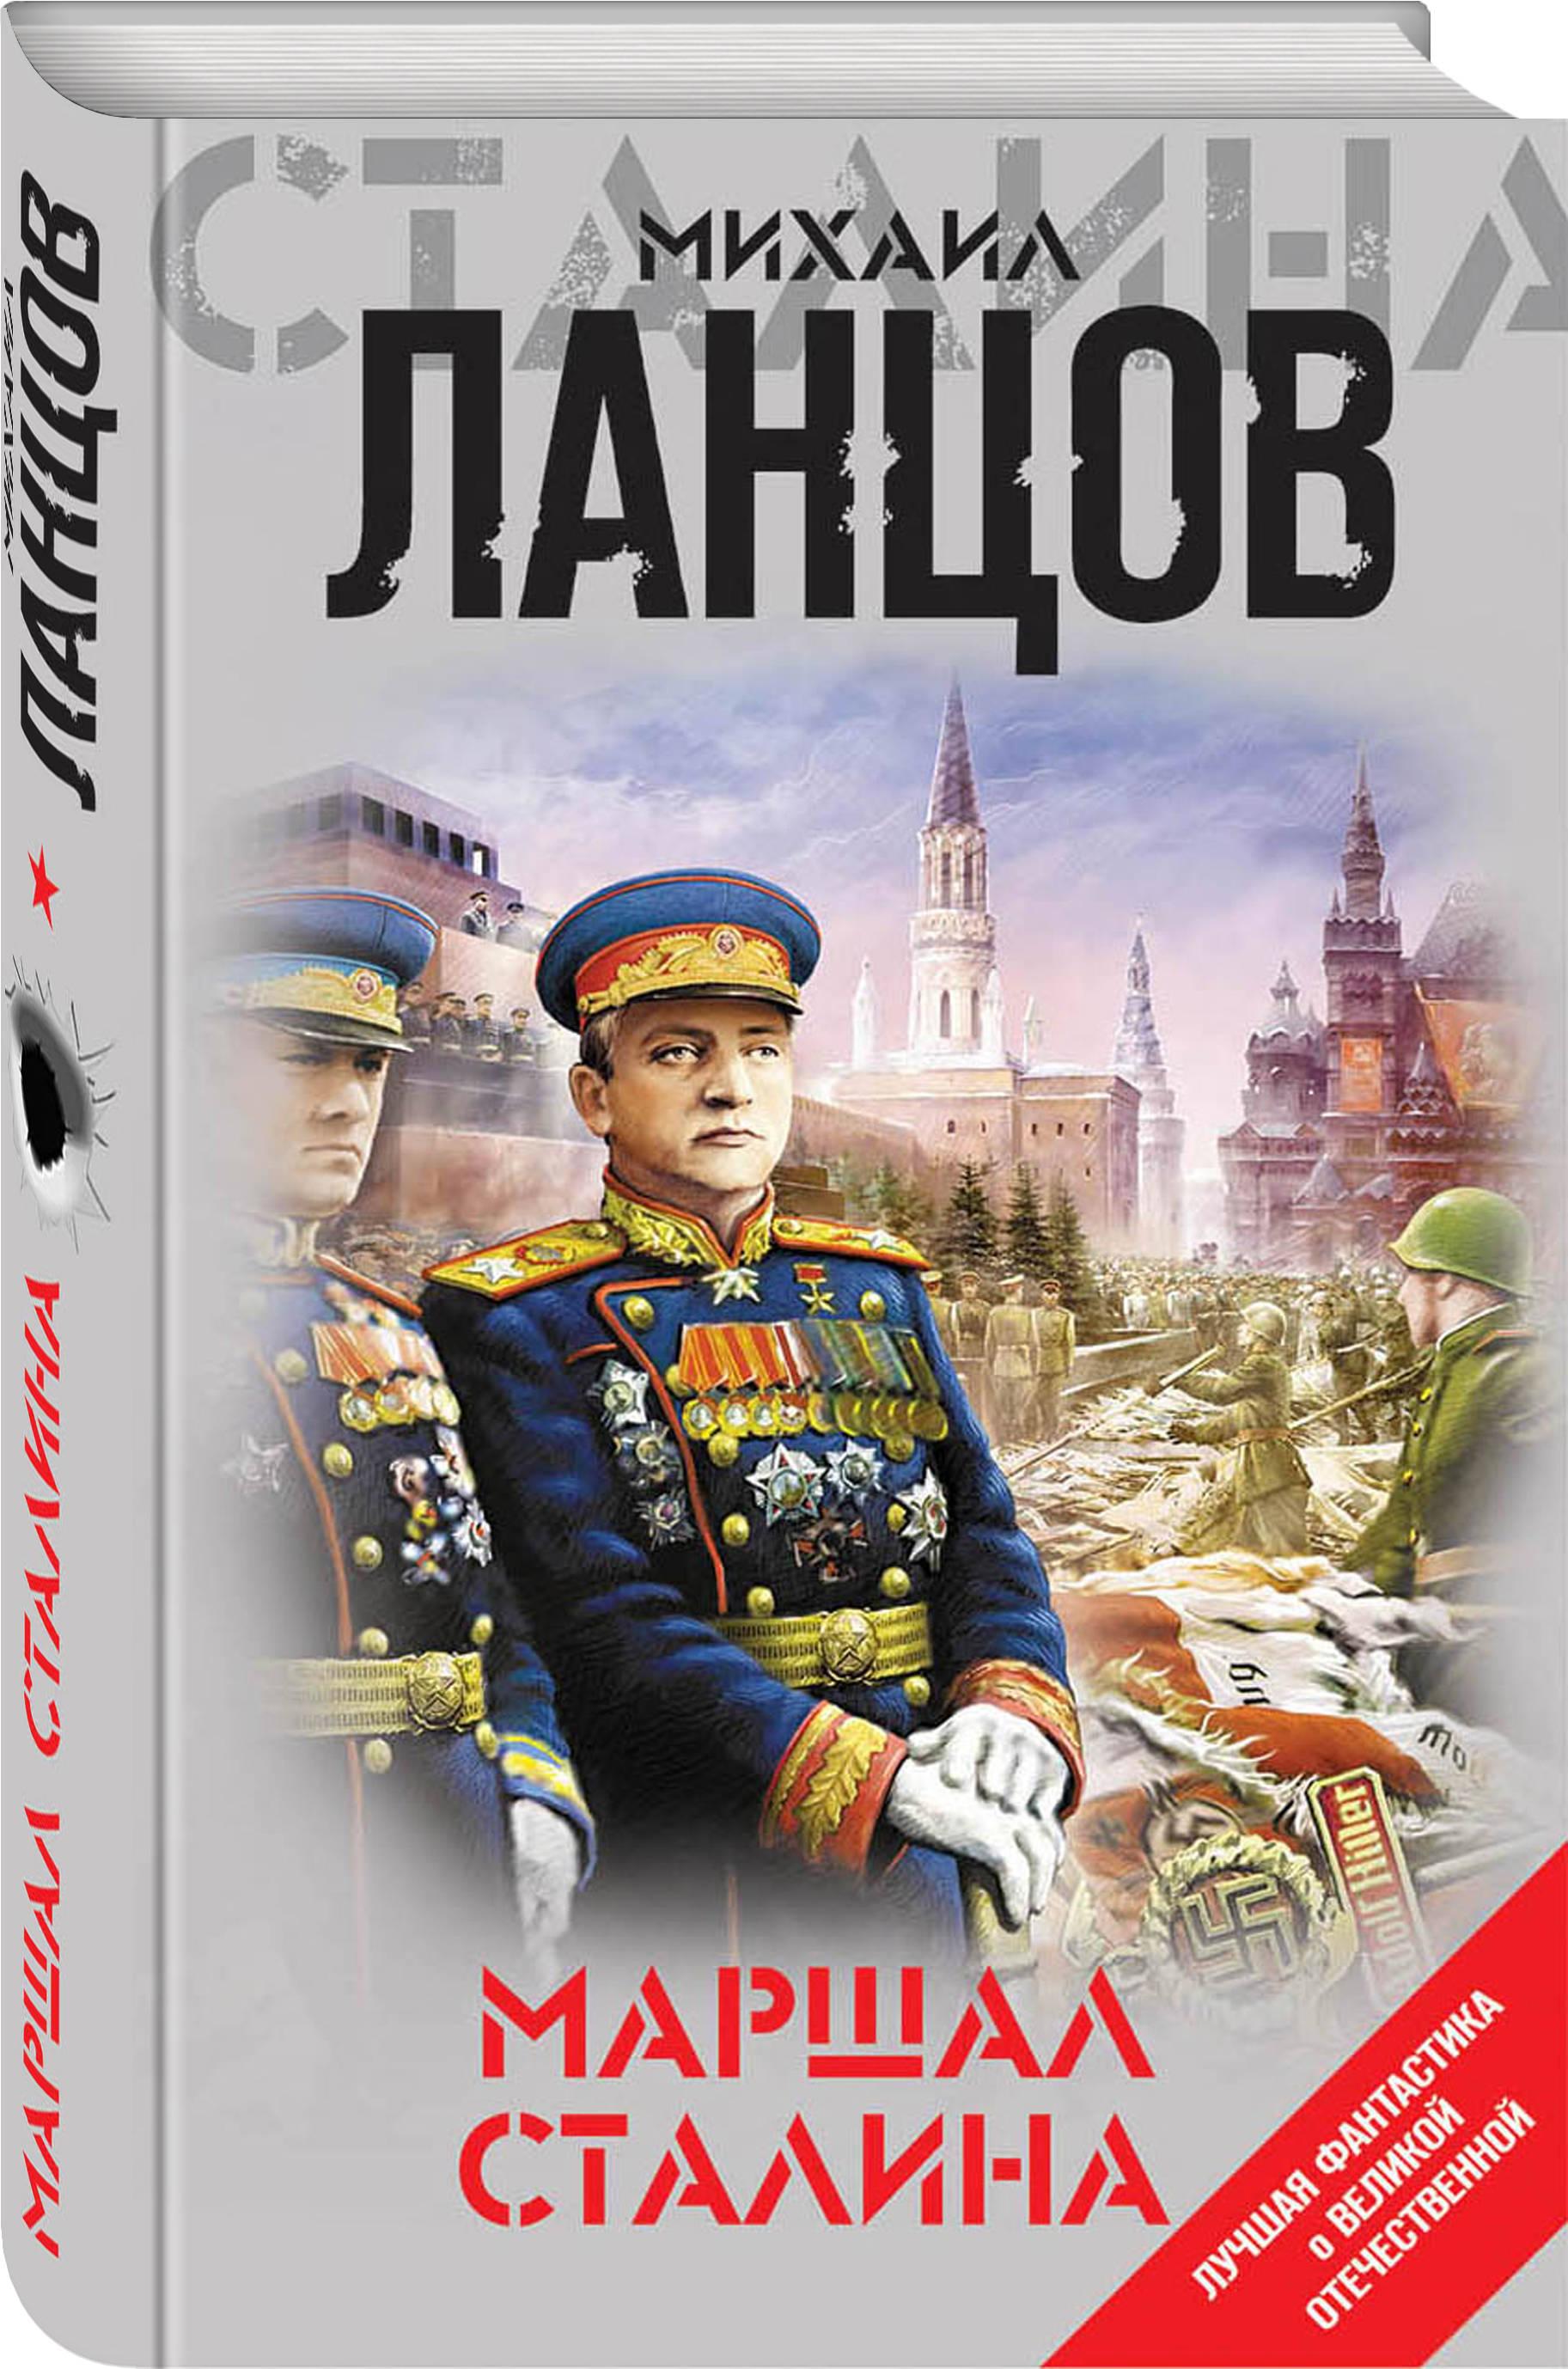 Михаил Ланцов Маршал Сталина